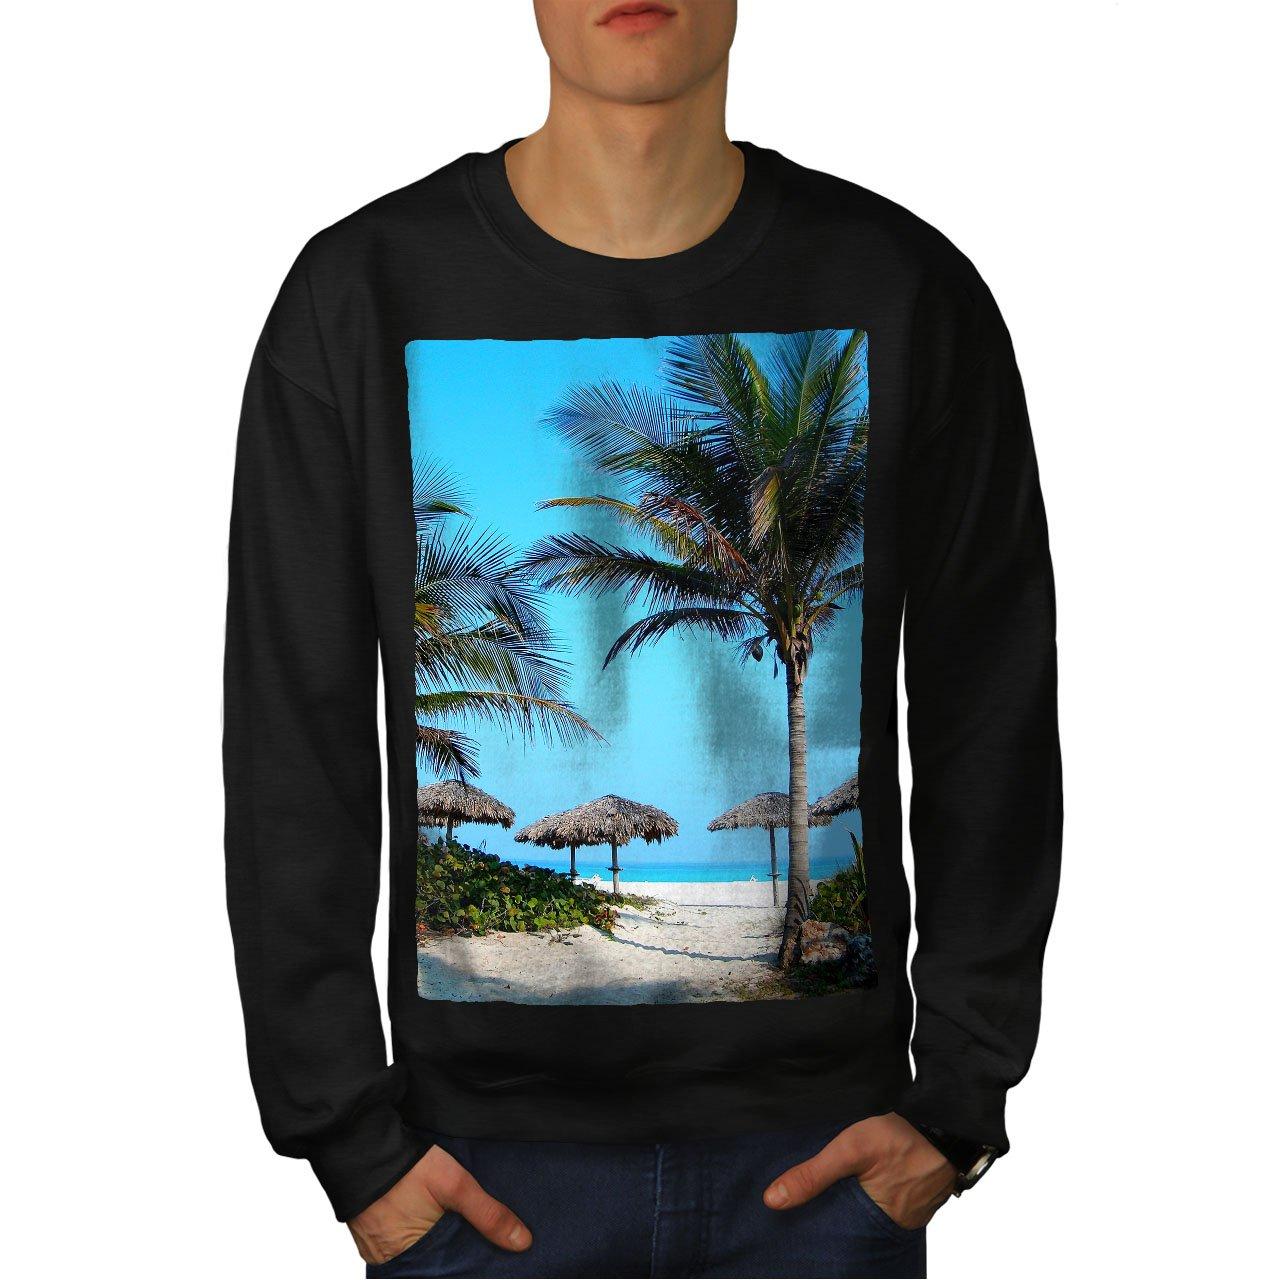 Sea Casual Jumper wellcoda Sea Beautiful Palm Nature Mens Sweatshirt